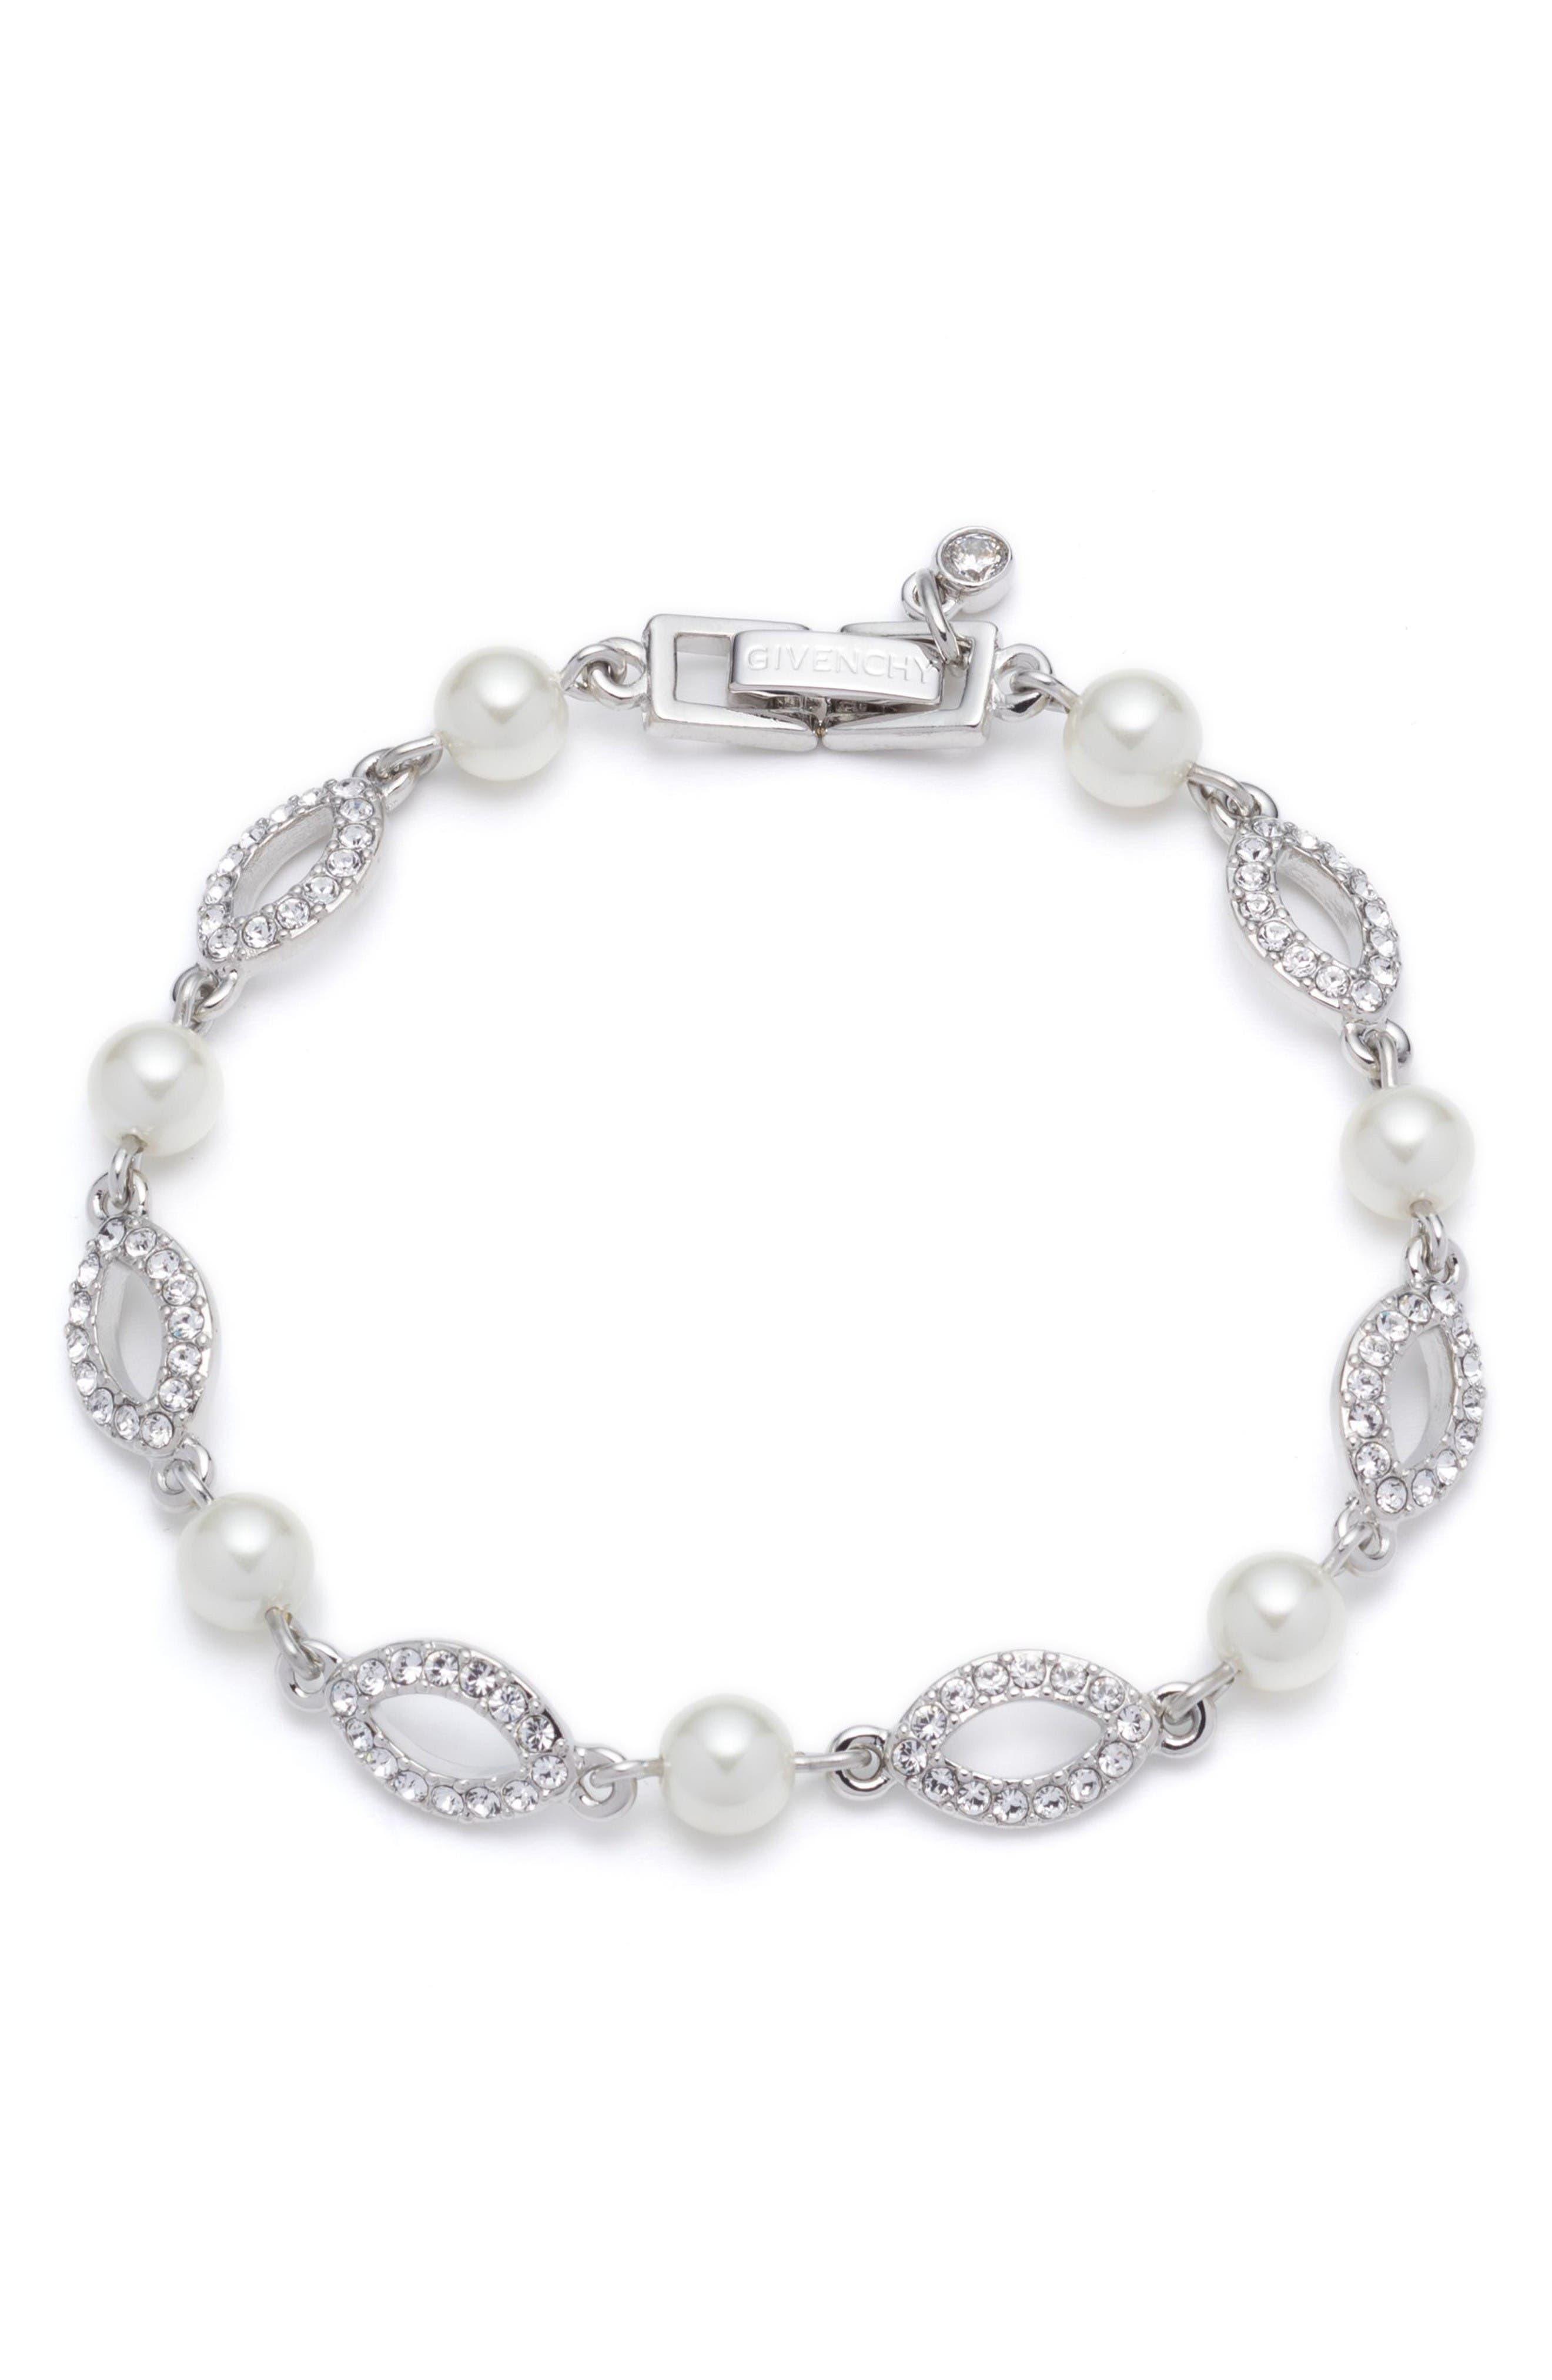 Givenchy Imitation Pearl & Crystal Line Bracelet